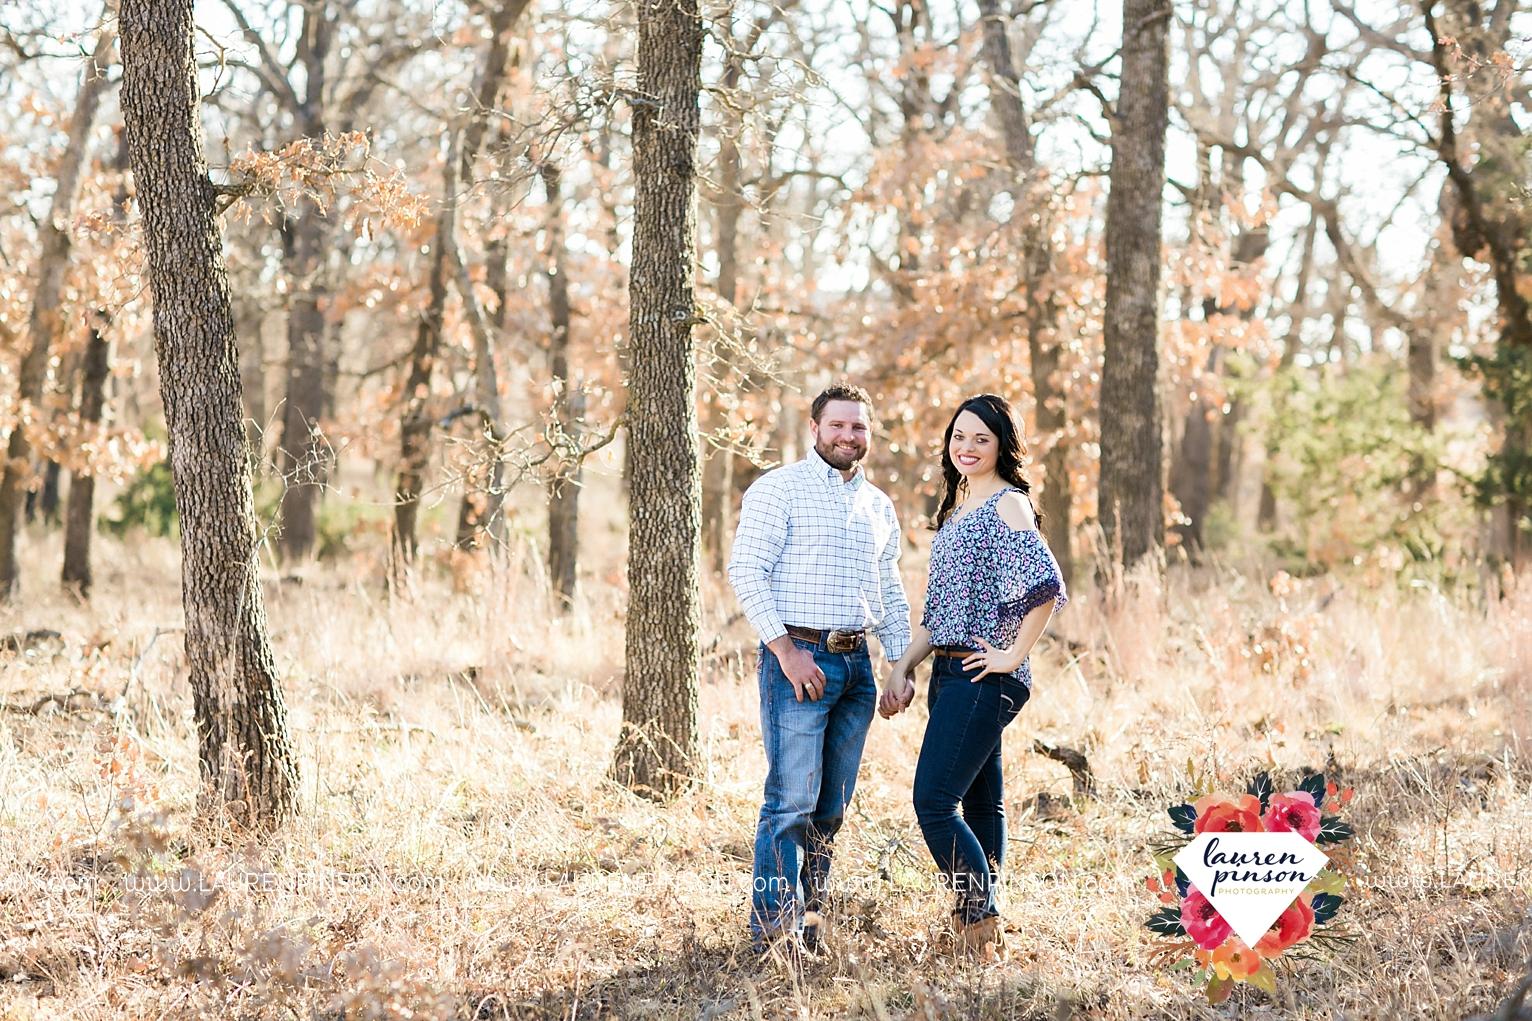 wichita-falls-texas-engagement-photographer-wedding-oklahoma-lawton-wichita-mountains-refuge-outdoors-mountains-engaged_2042.jpg